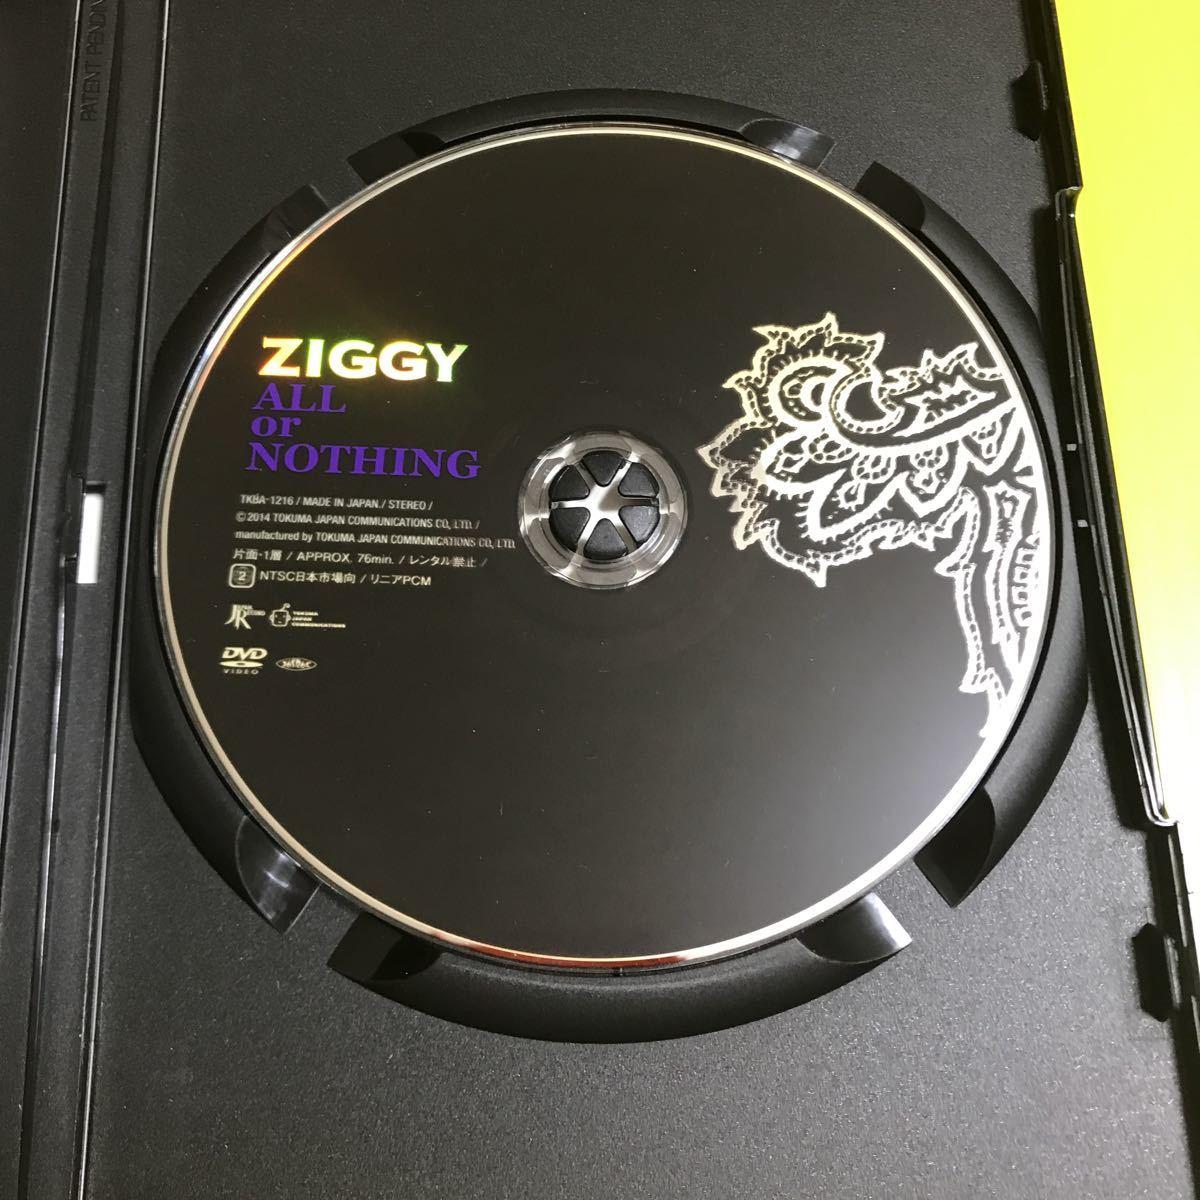 DVD   ZIGGY ALL or NOTHING  ジギー 1990.11.1国立代々木競技場第一体育館LIVE 再生確認済_画像4